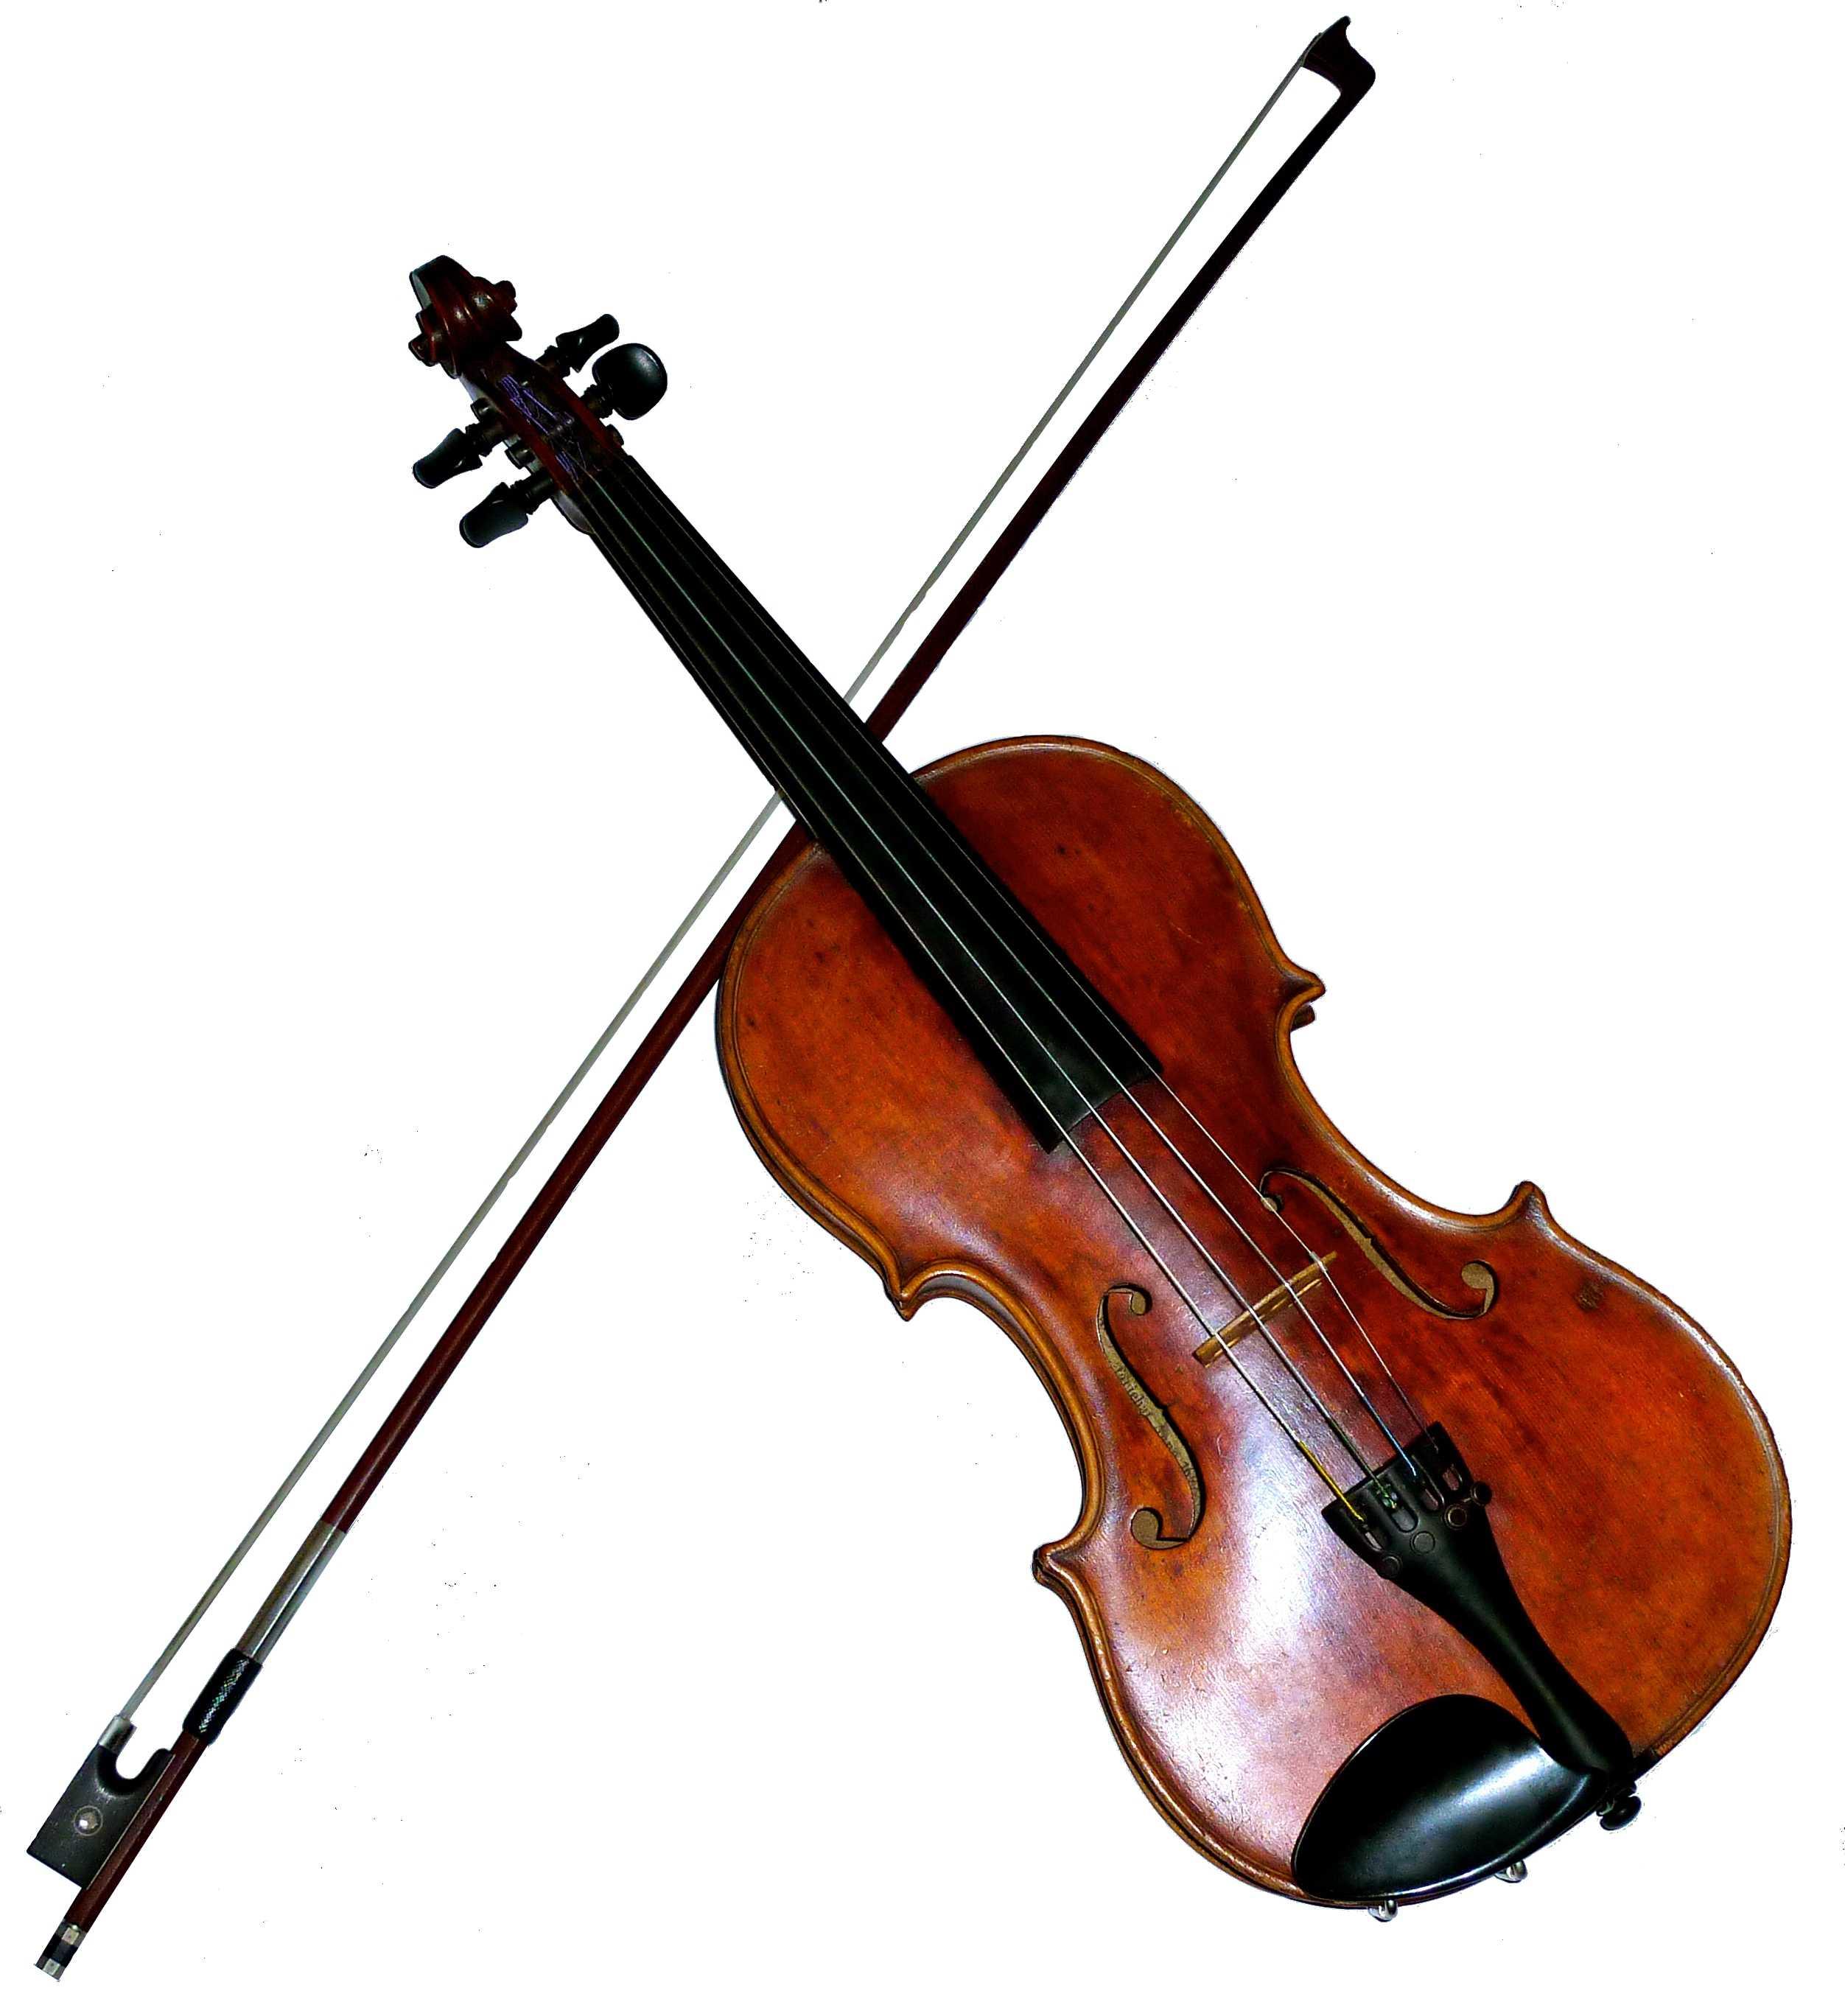 Elina Hakanen - Violin and Rachel Talbot - Soprano